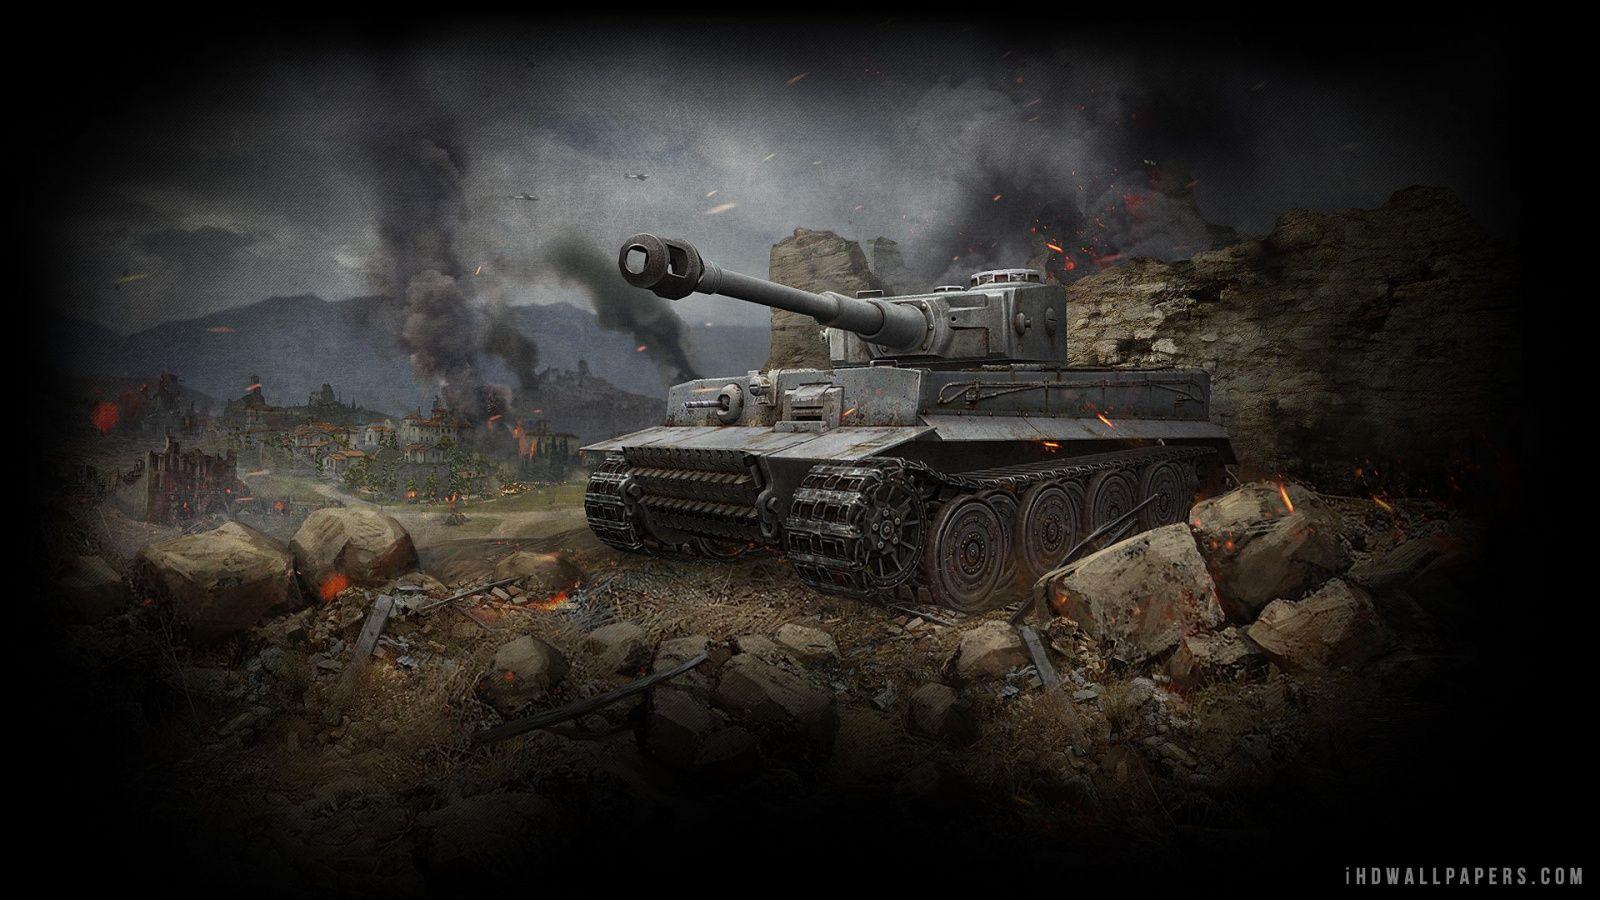 Tiger Tank Wallpaper For Iphone Tank Wallpaper World Of Tanks Tiger Tank